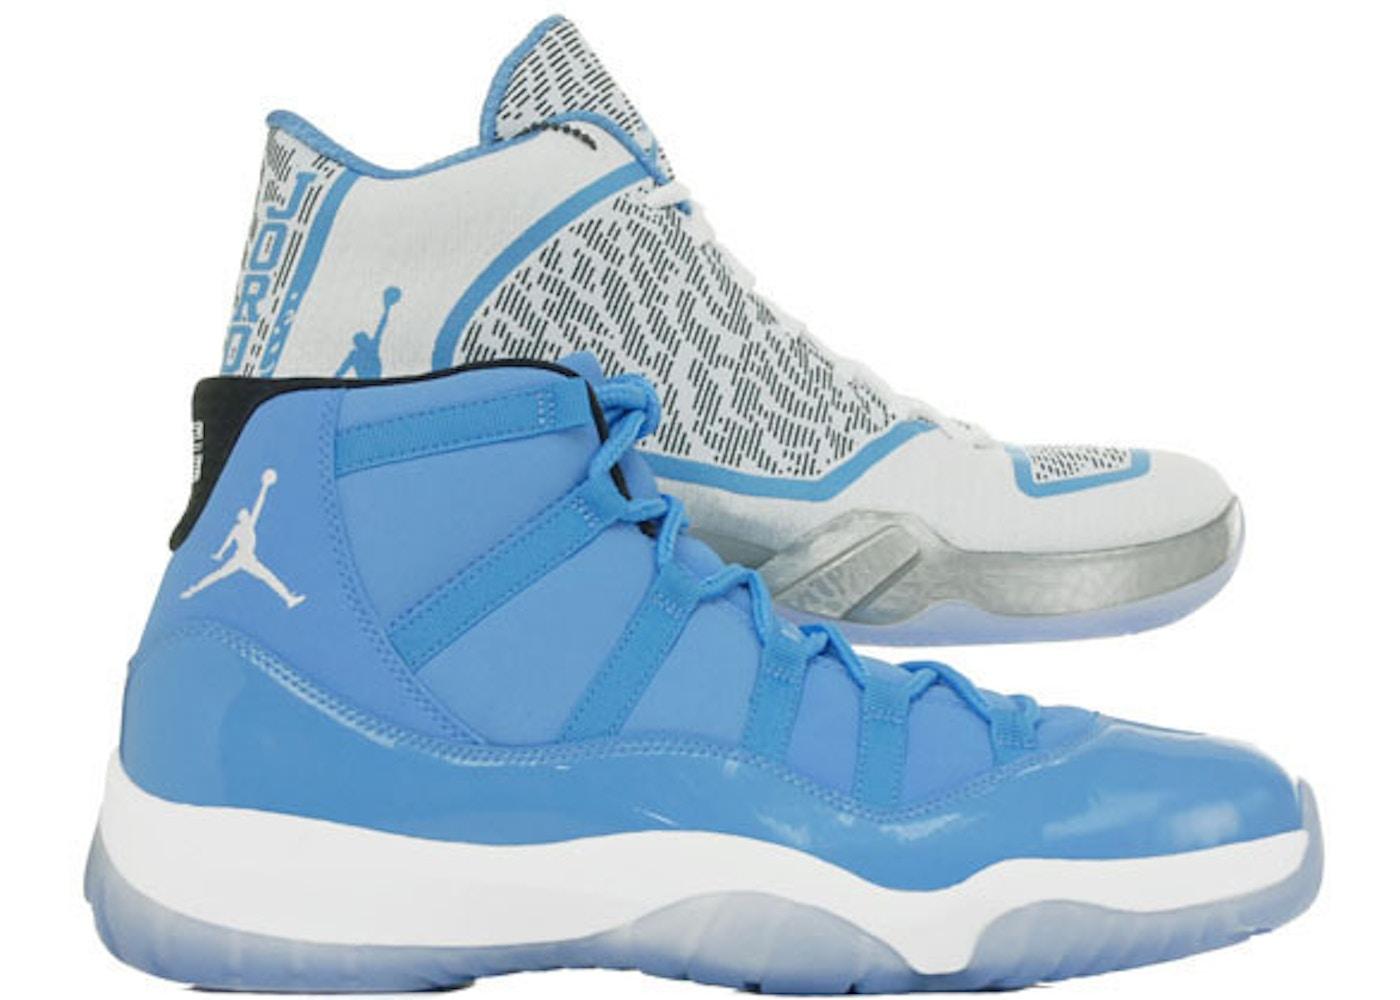 finest selection 487e8 c8030 Buy Air Jordan Packs Shoes   Deadstock Sneakers